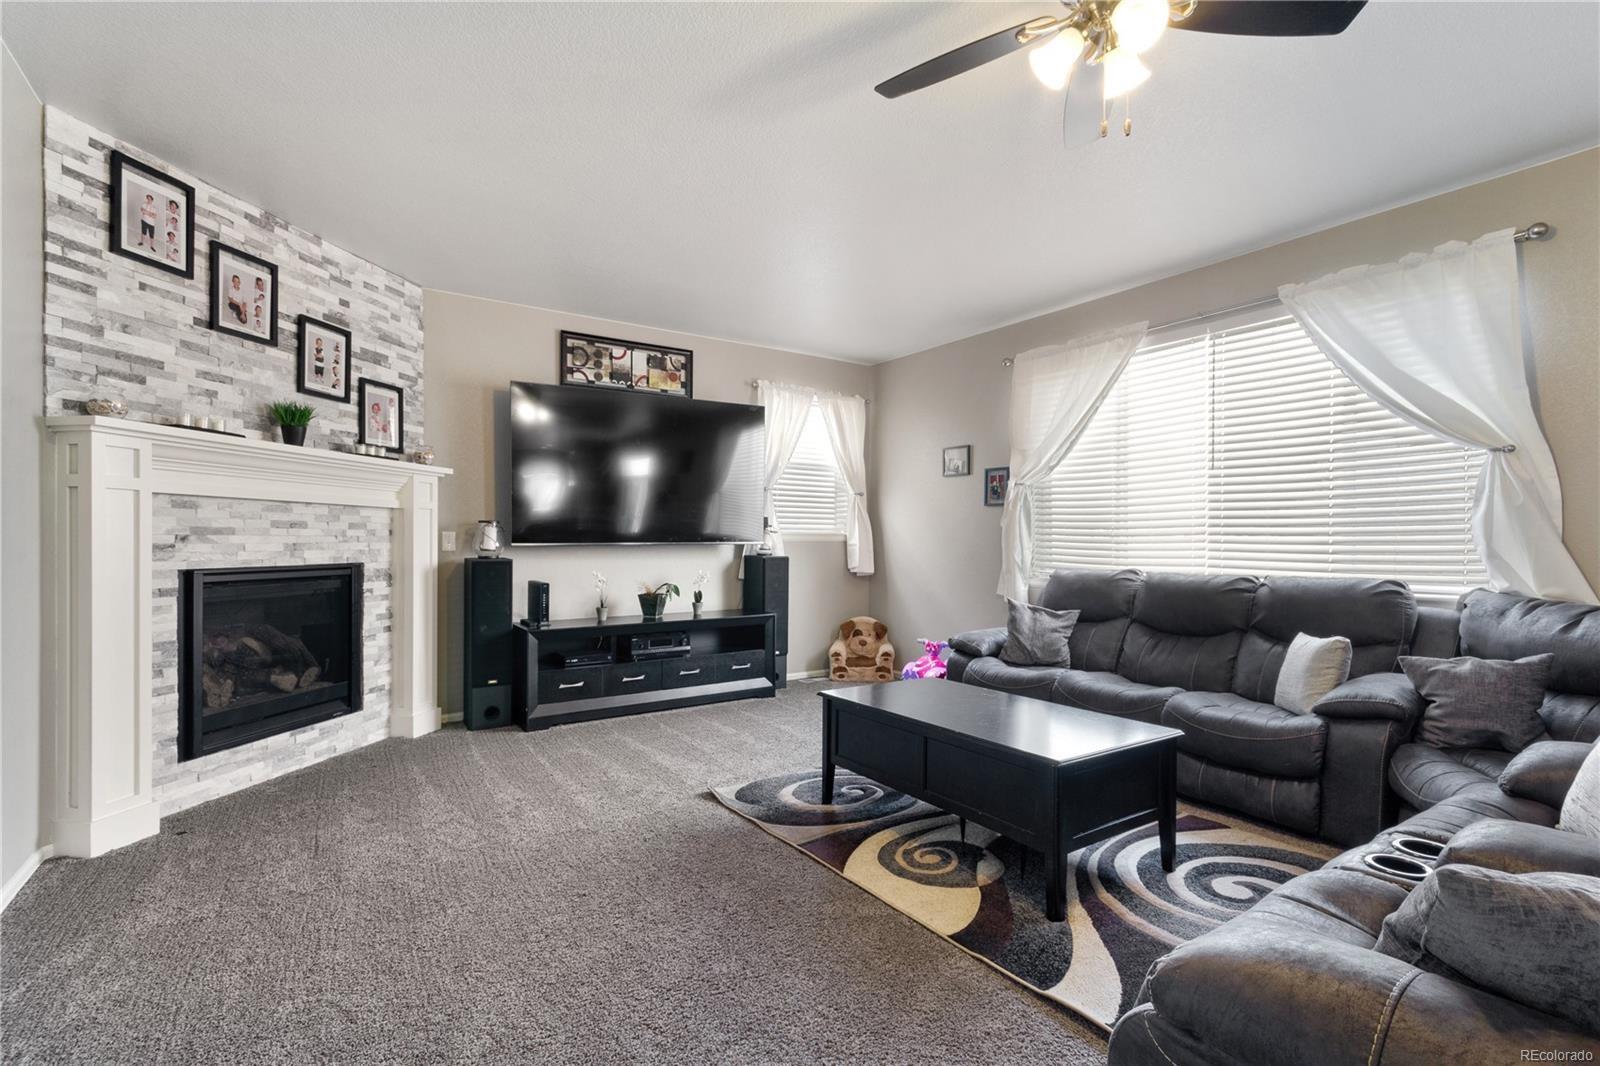 MLS# 4600832 - 1 - 1229  W 171st Place, Broomfield, CO 80023